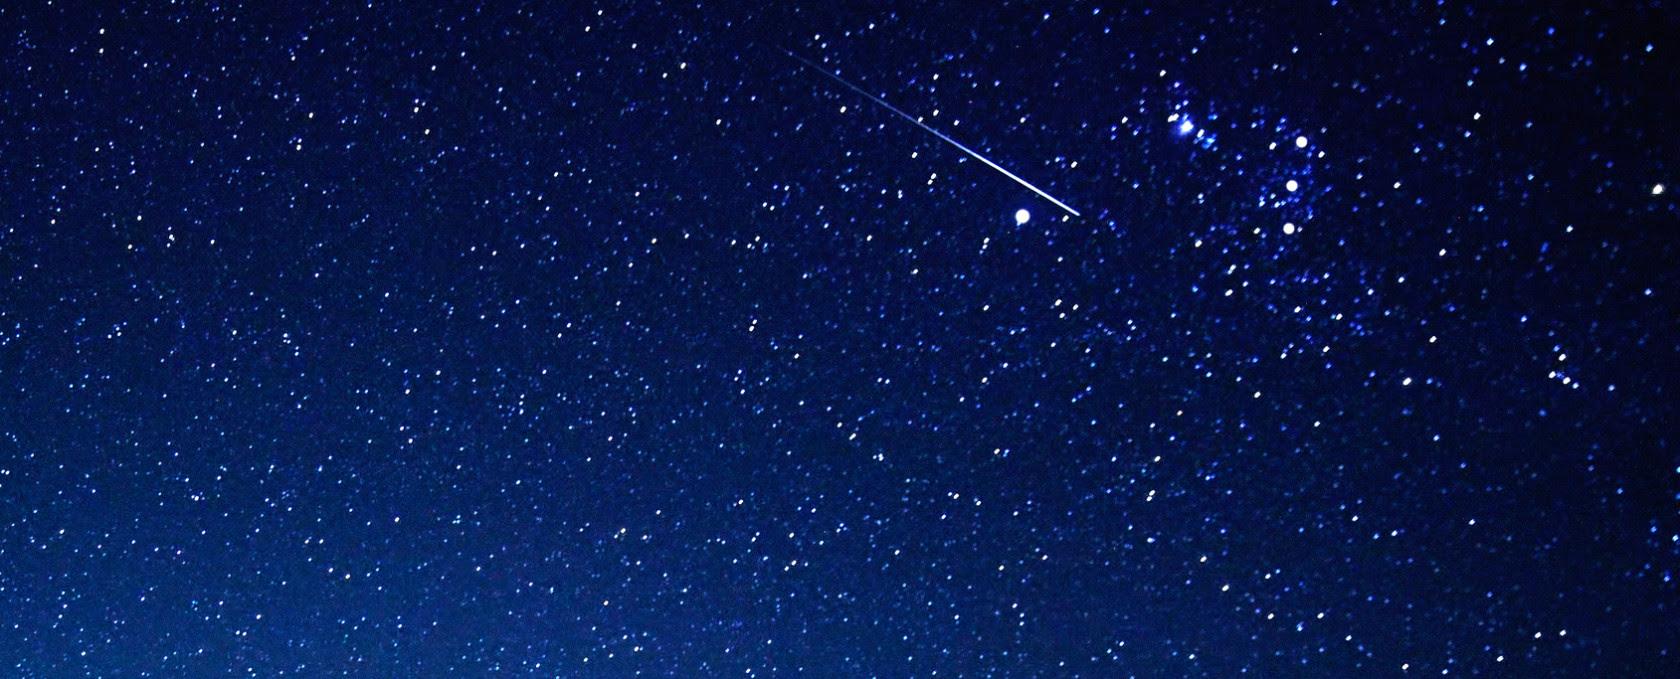 Risultati immagini per san lorenzo stelle cadenti